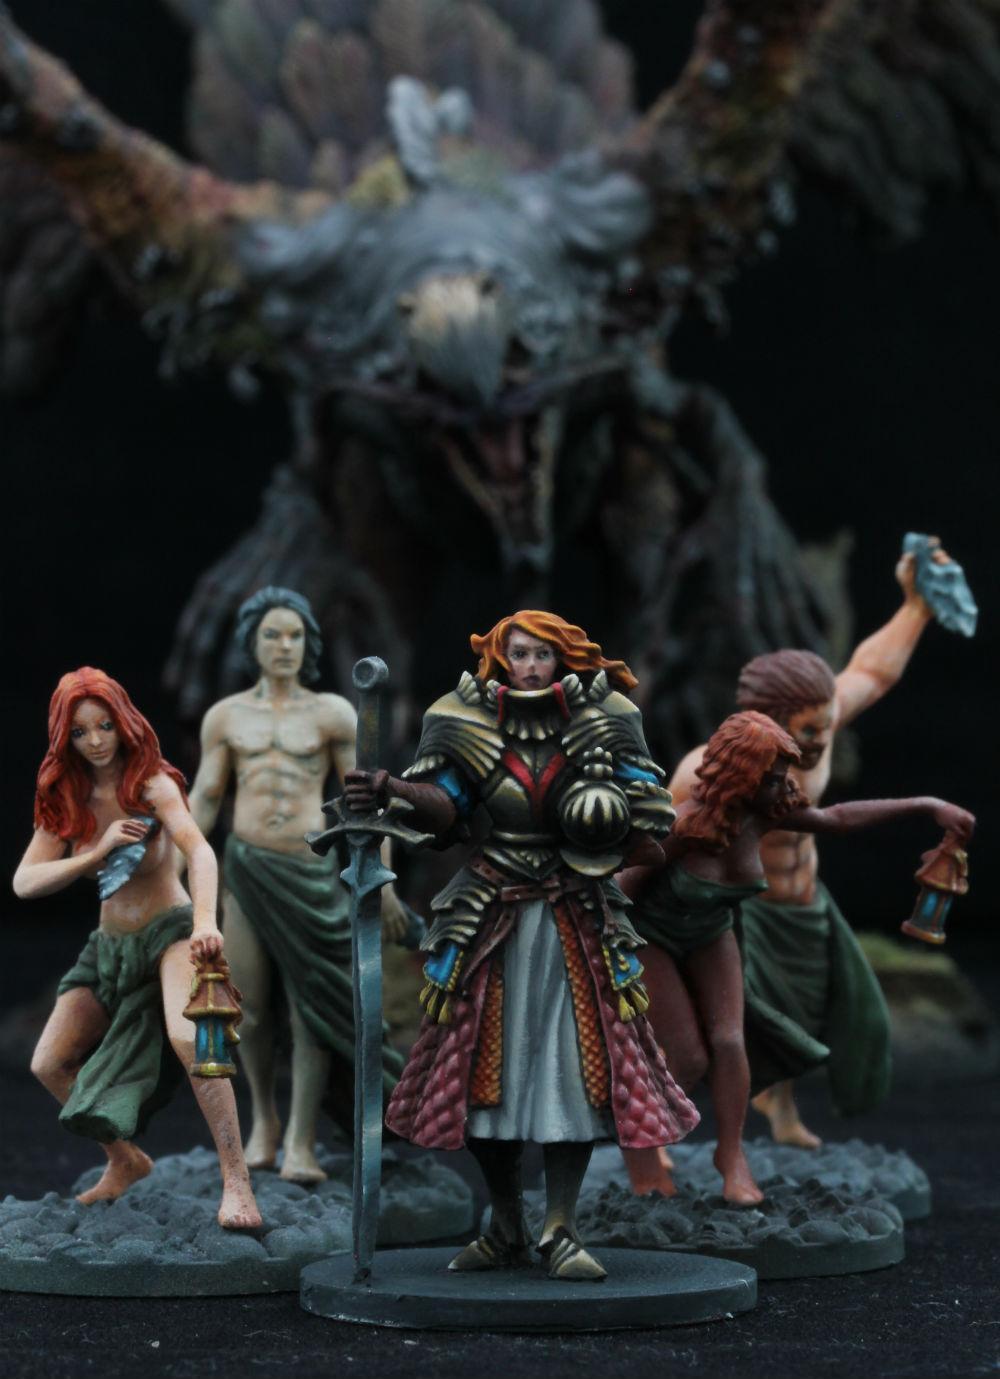 Female, Horrors, Kingdom Death, Knights, Miniatures, Terror, Warhammer Fantasy